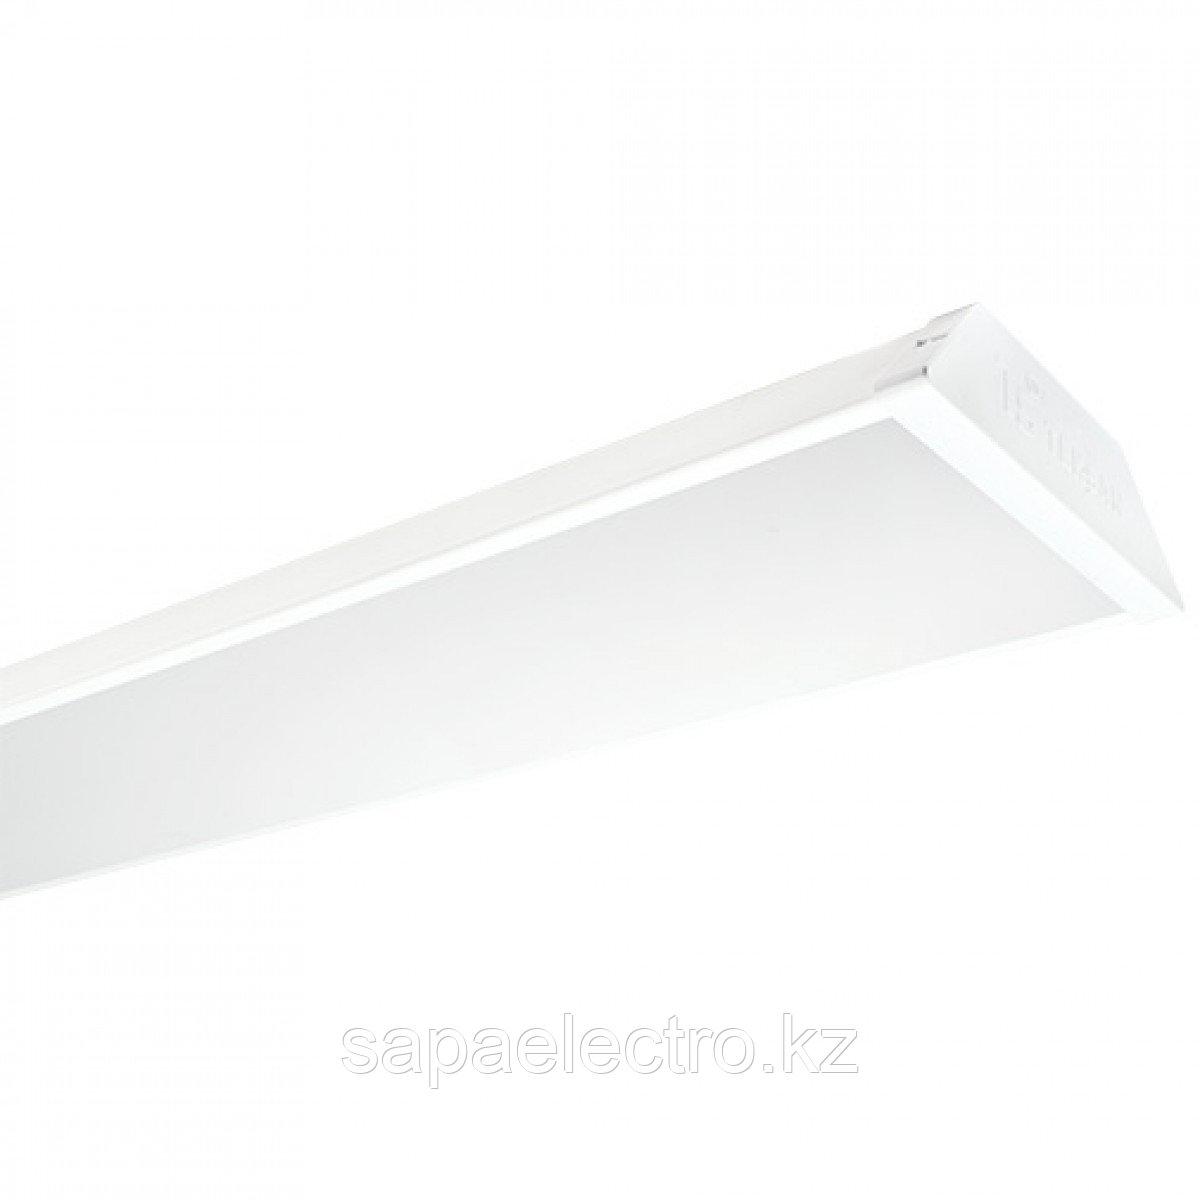 Св-к LEDTUBE LINEAR OPAL 2x9W+лампа (60см) IP20 MGL